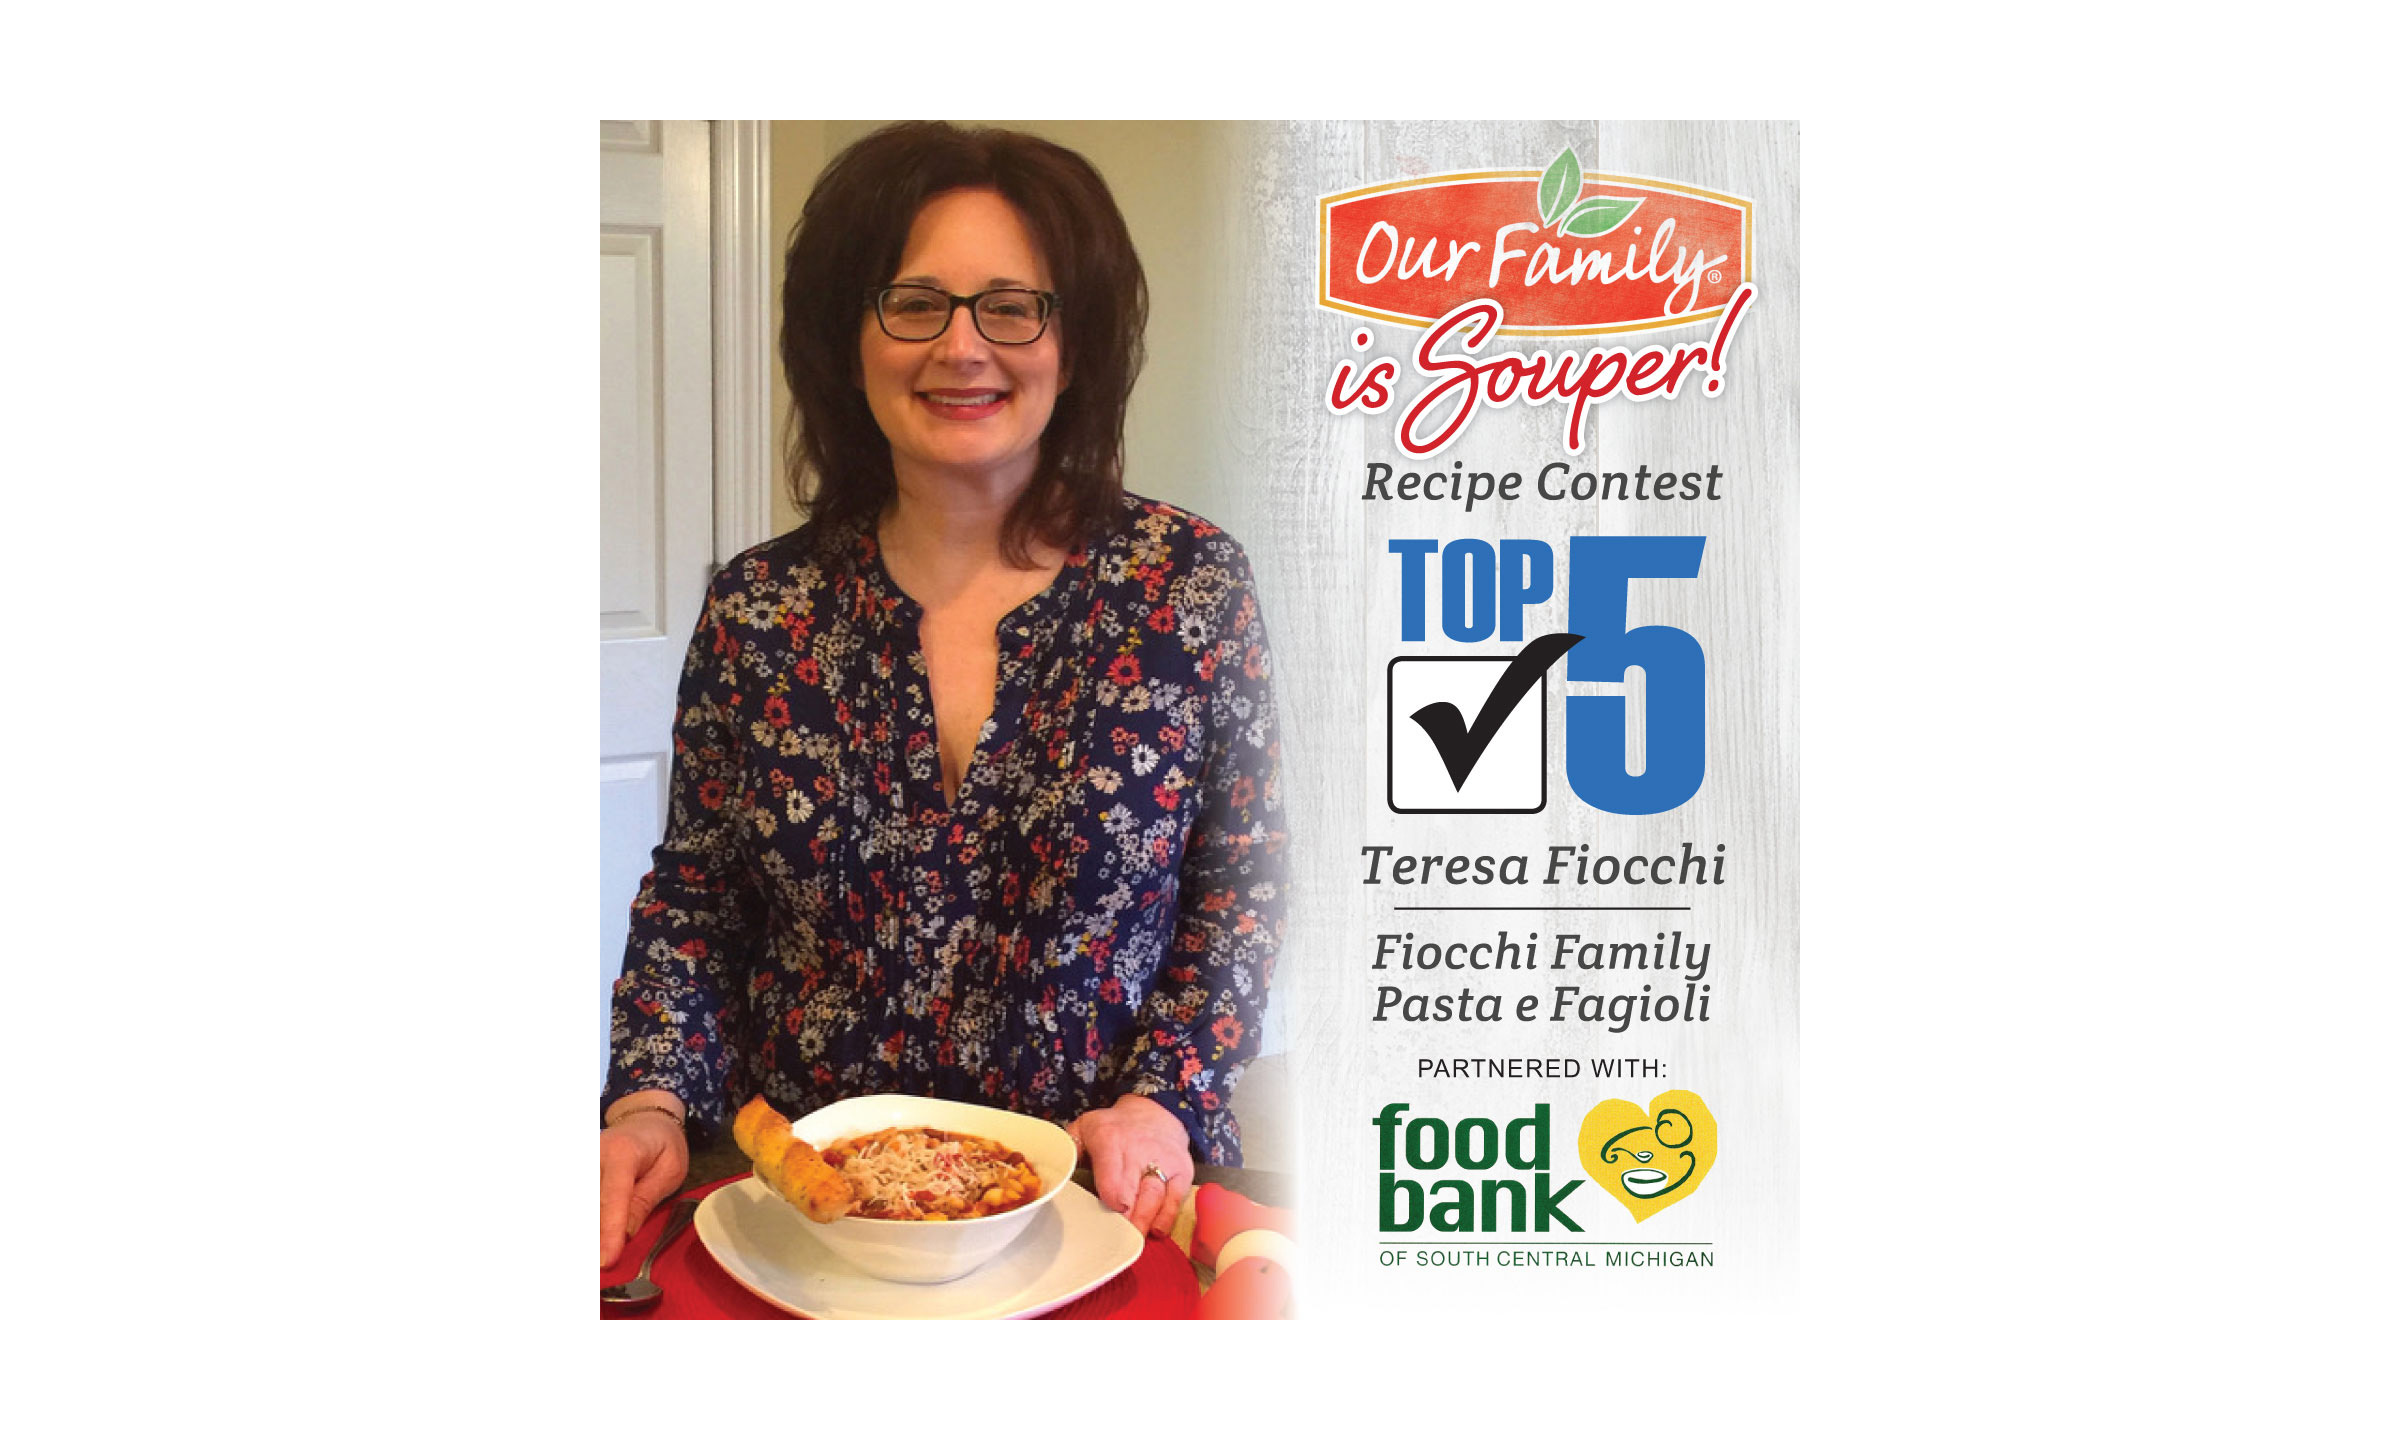 Teresa Fiocchi and her Pasta e Fagioli soup.